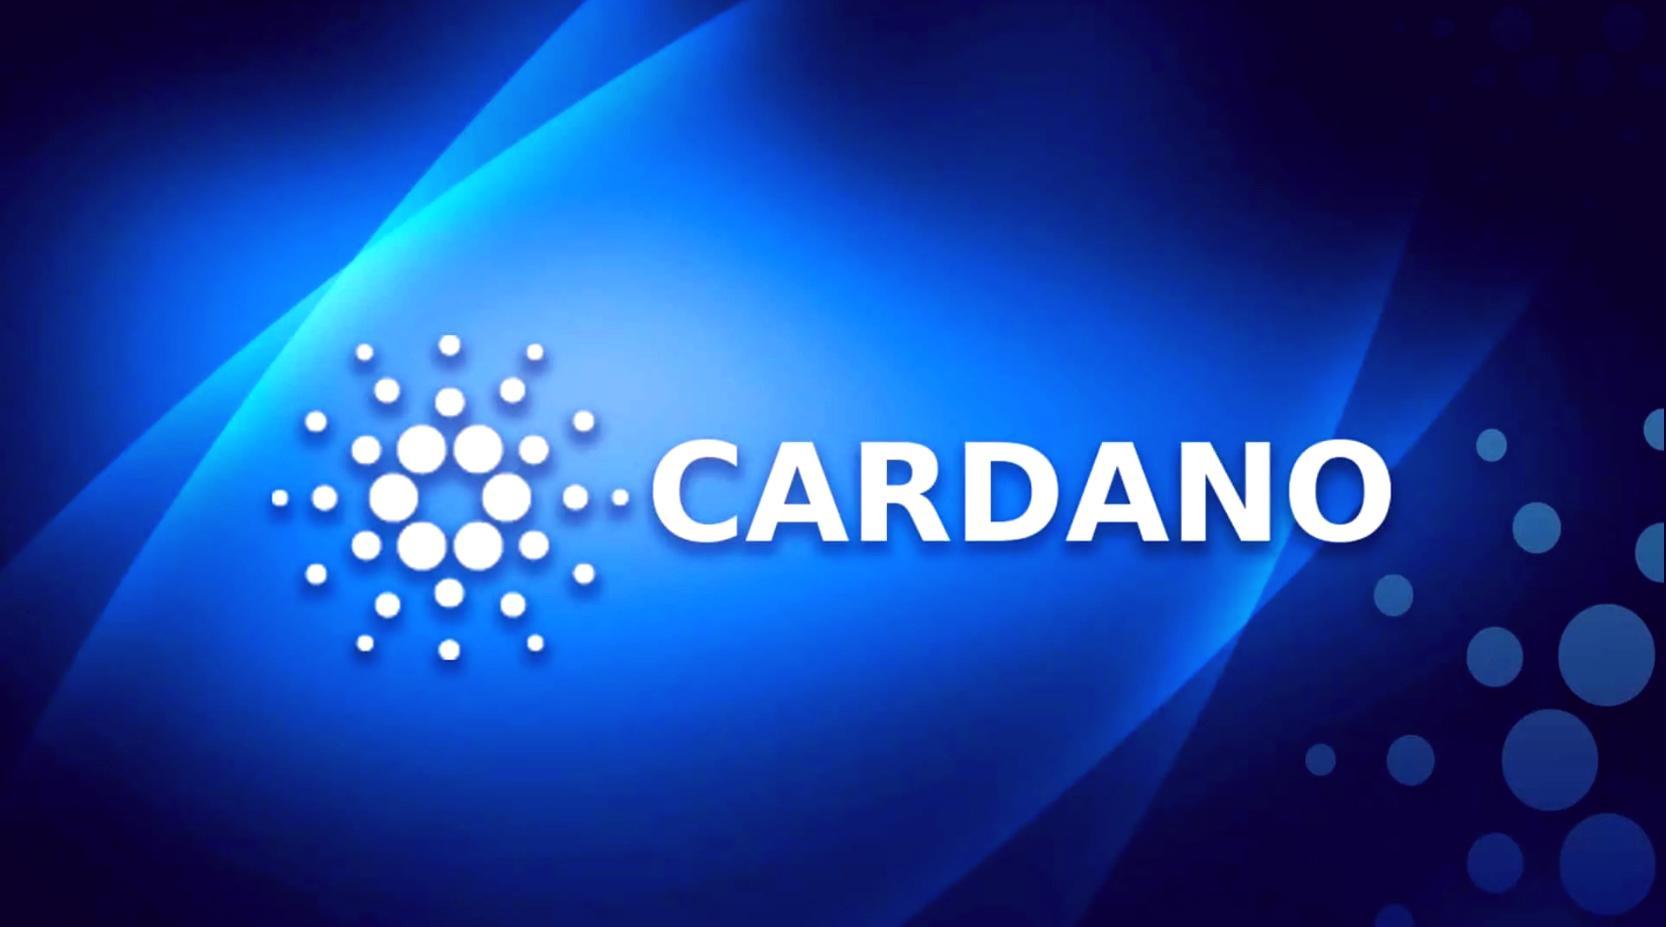 CARDANO-08-freshblue